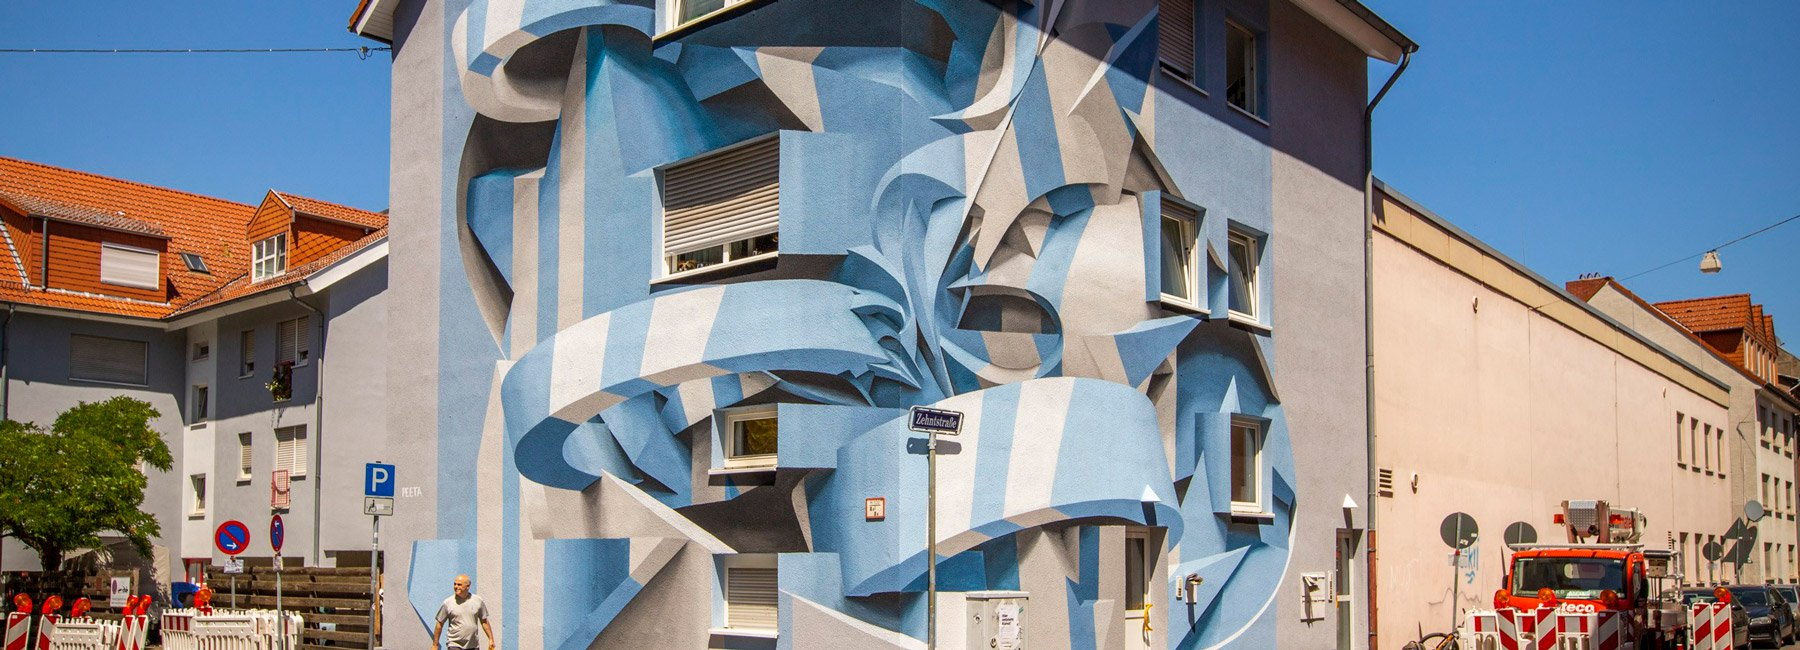 Художник перетворив фасад будинку на мурал